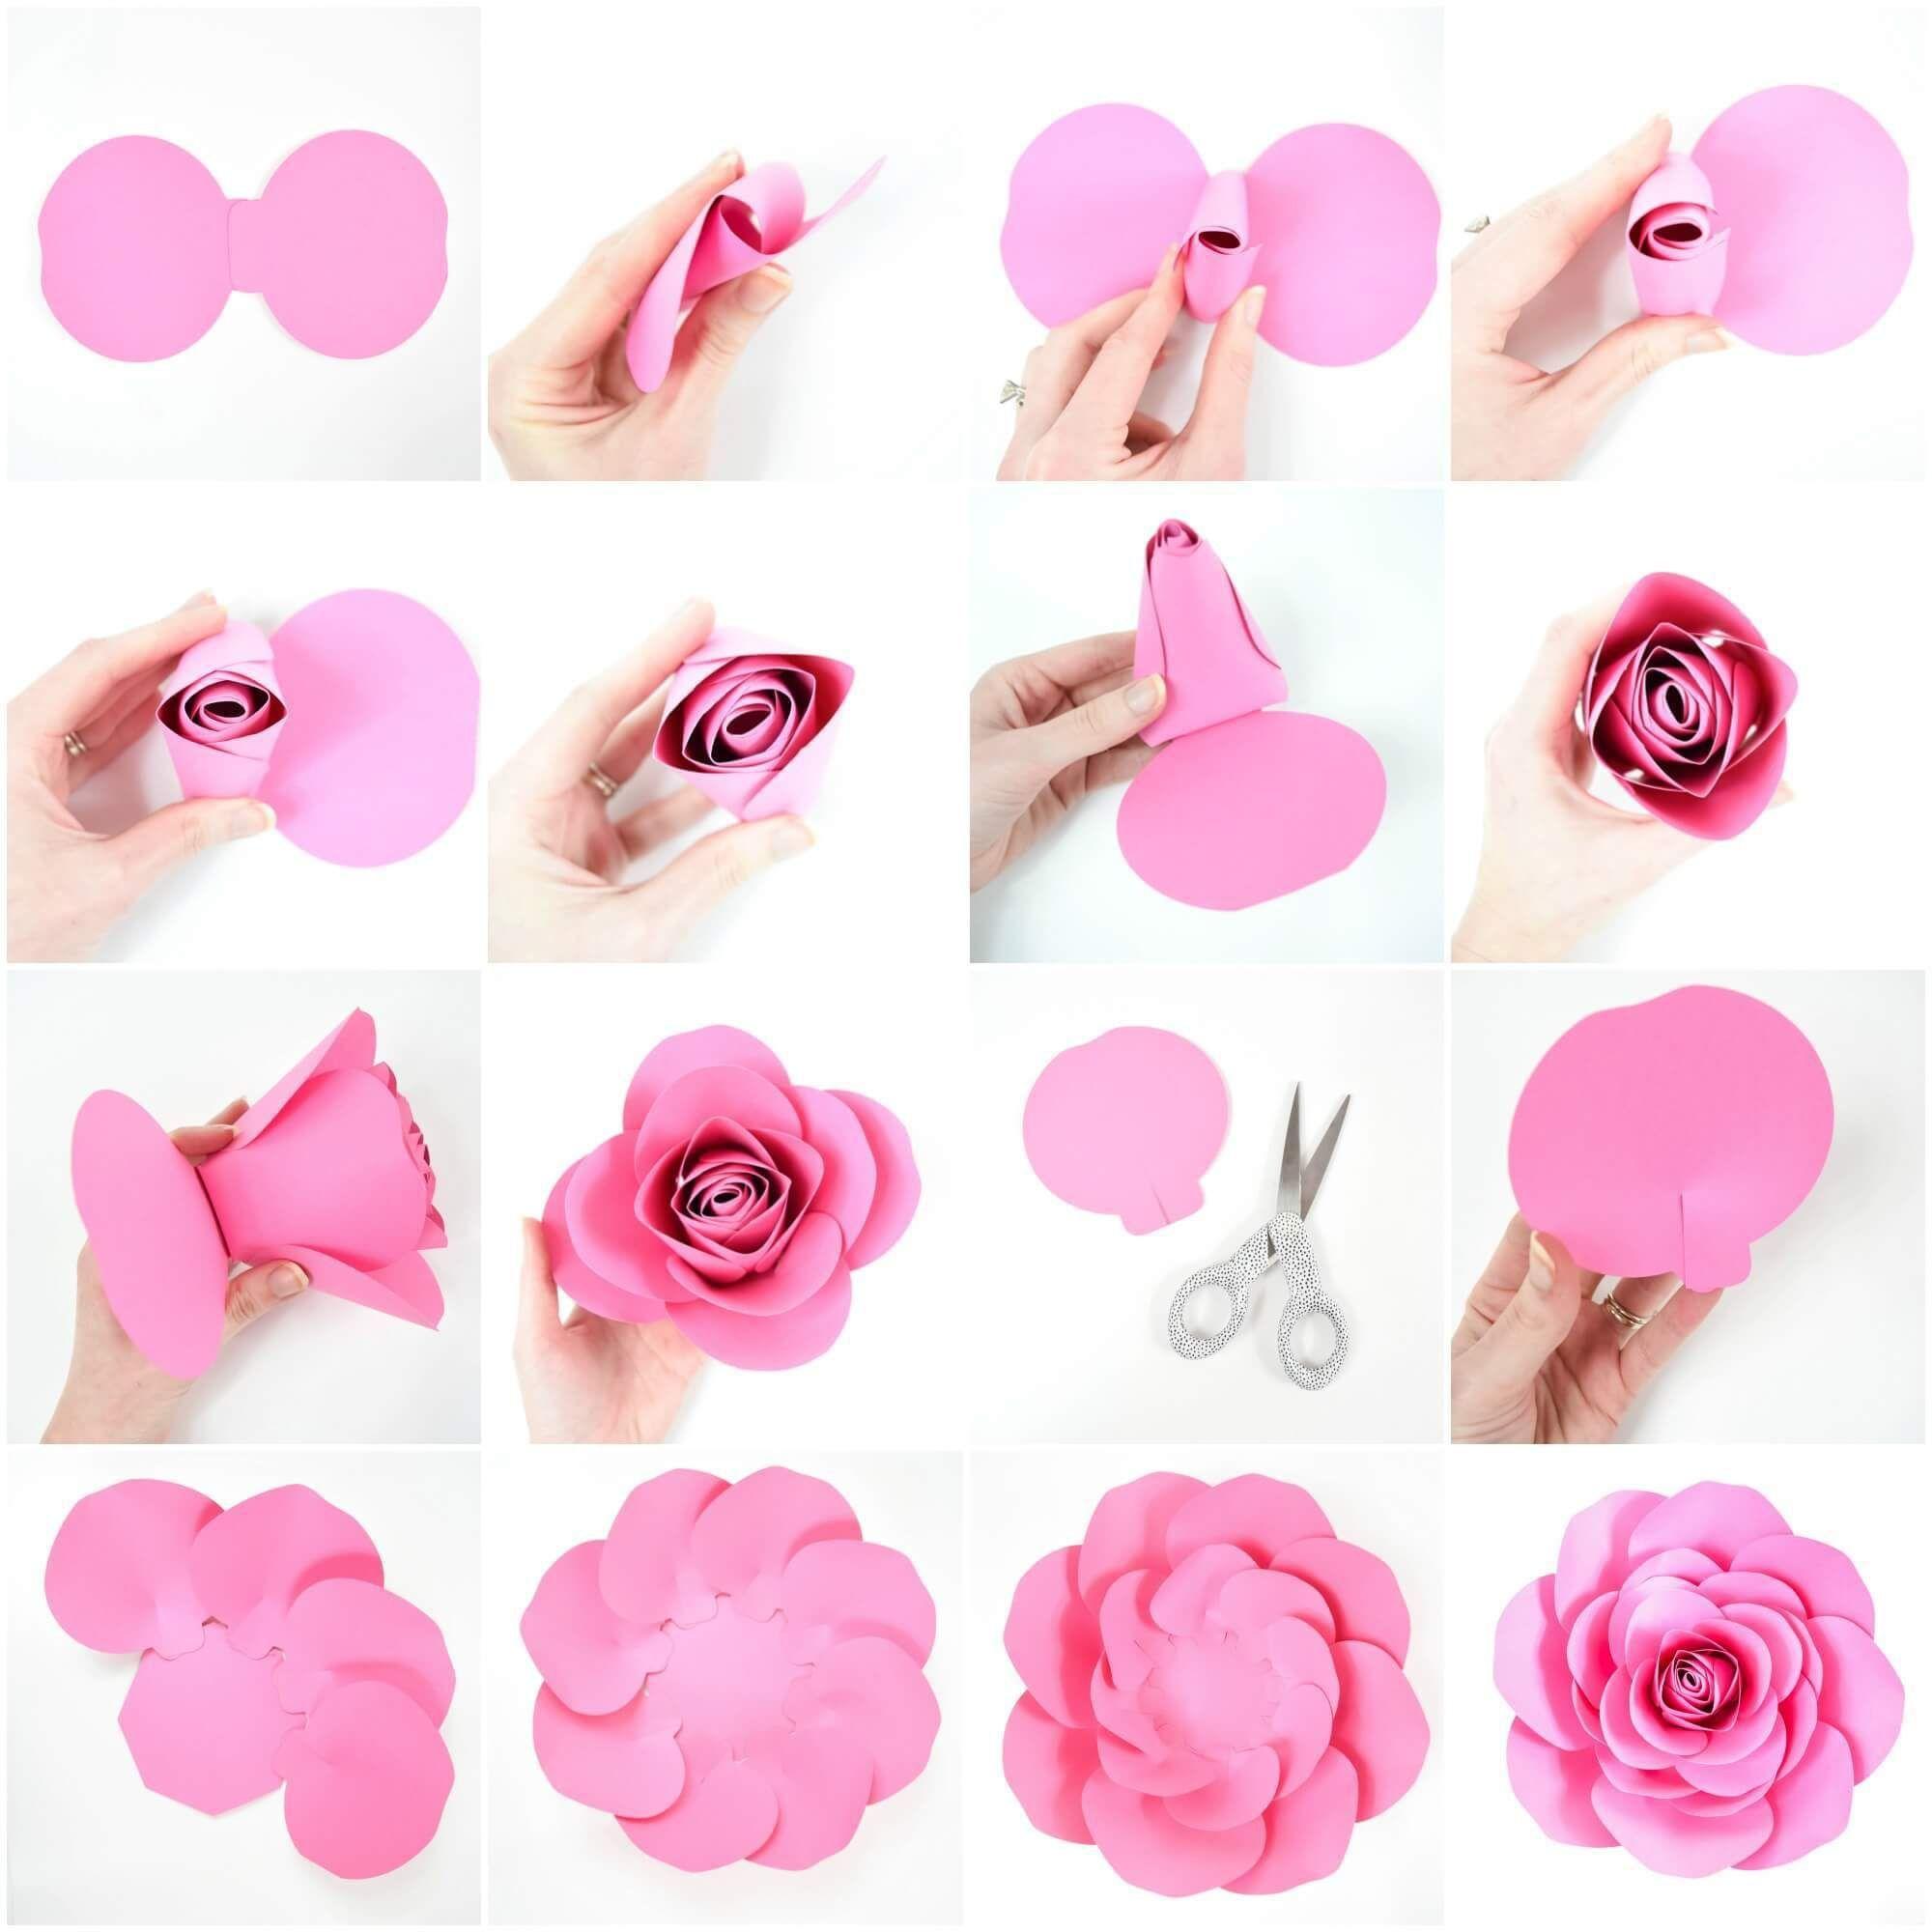 001 Stupendou Free Printable Diy Paper Flower Template Image  TemplatesFull